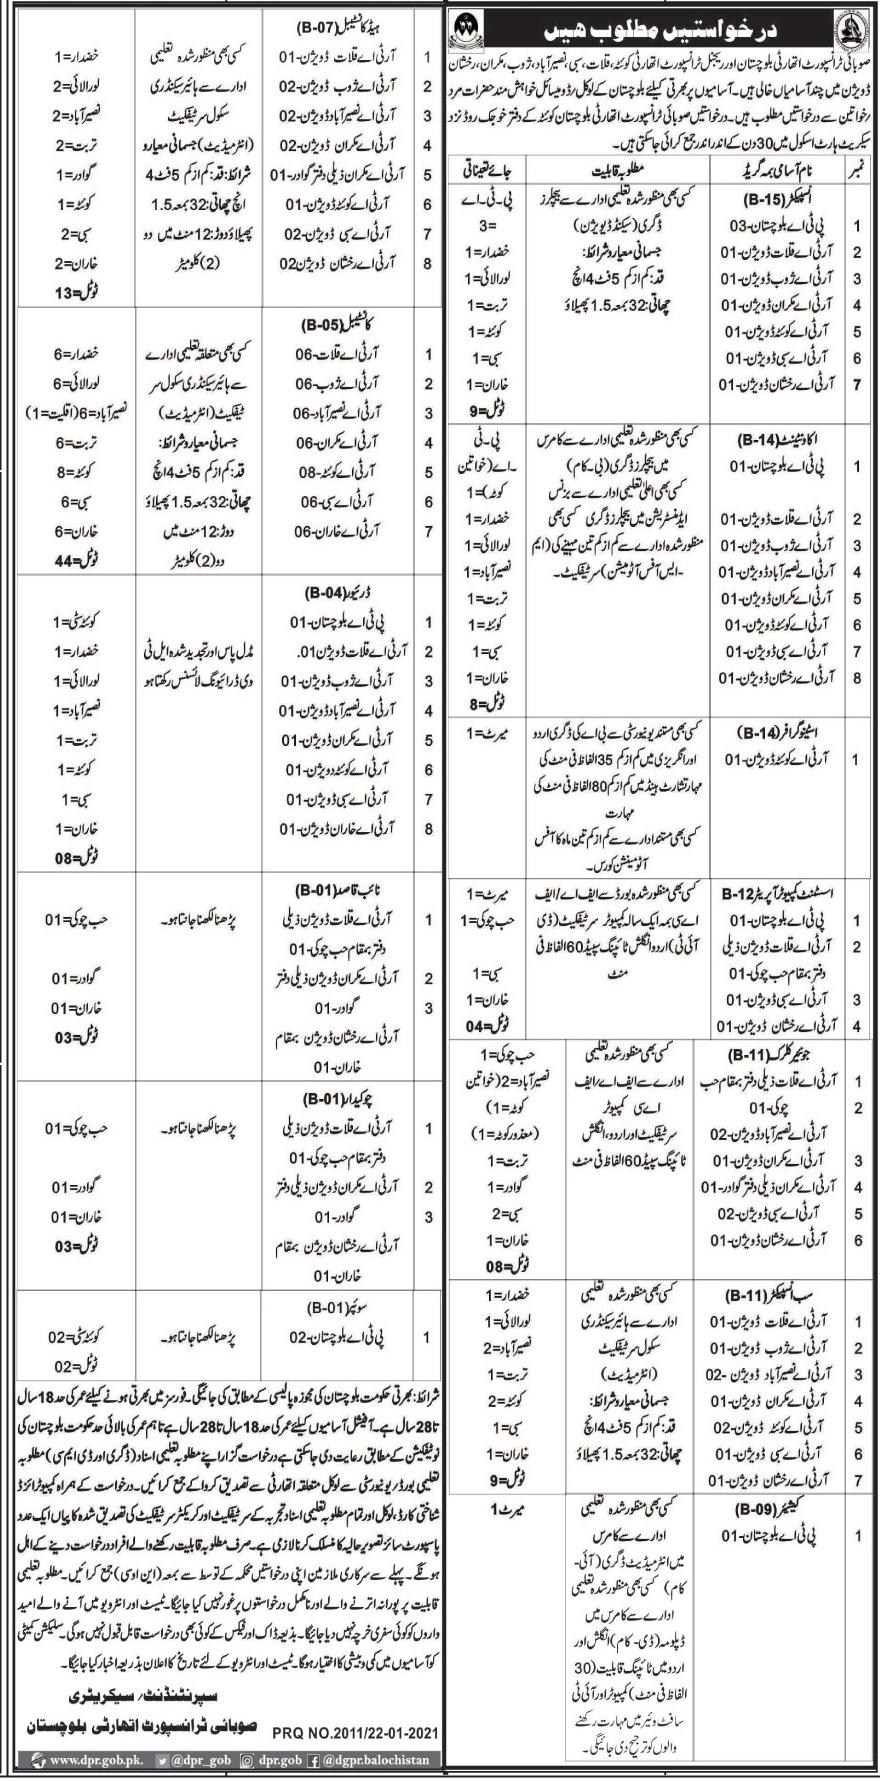 Latest Traffic Police Jobs 2021, Provincial Transport Authority PTA Balochistan  Jobs 2021